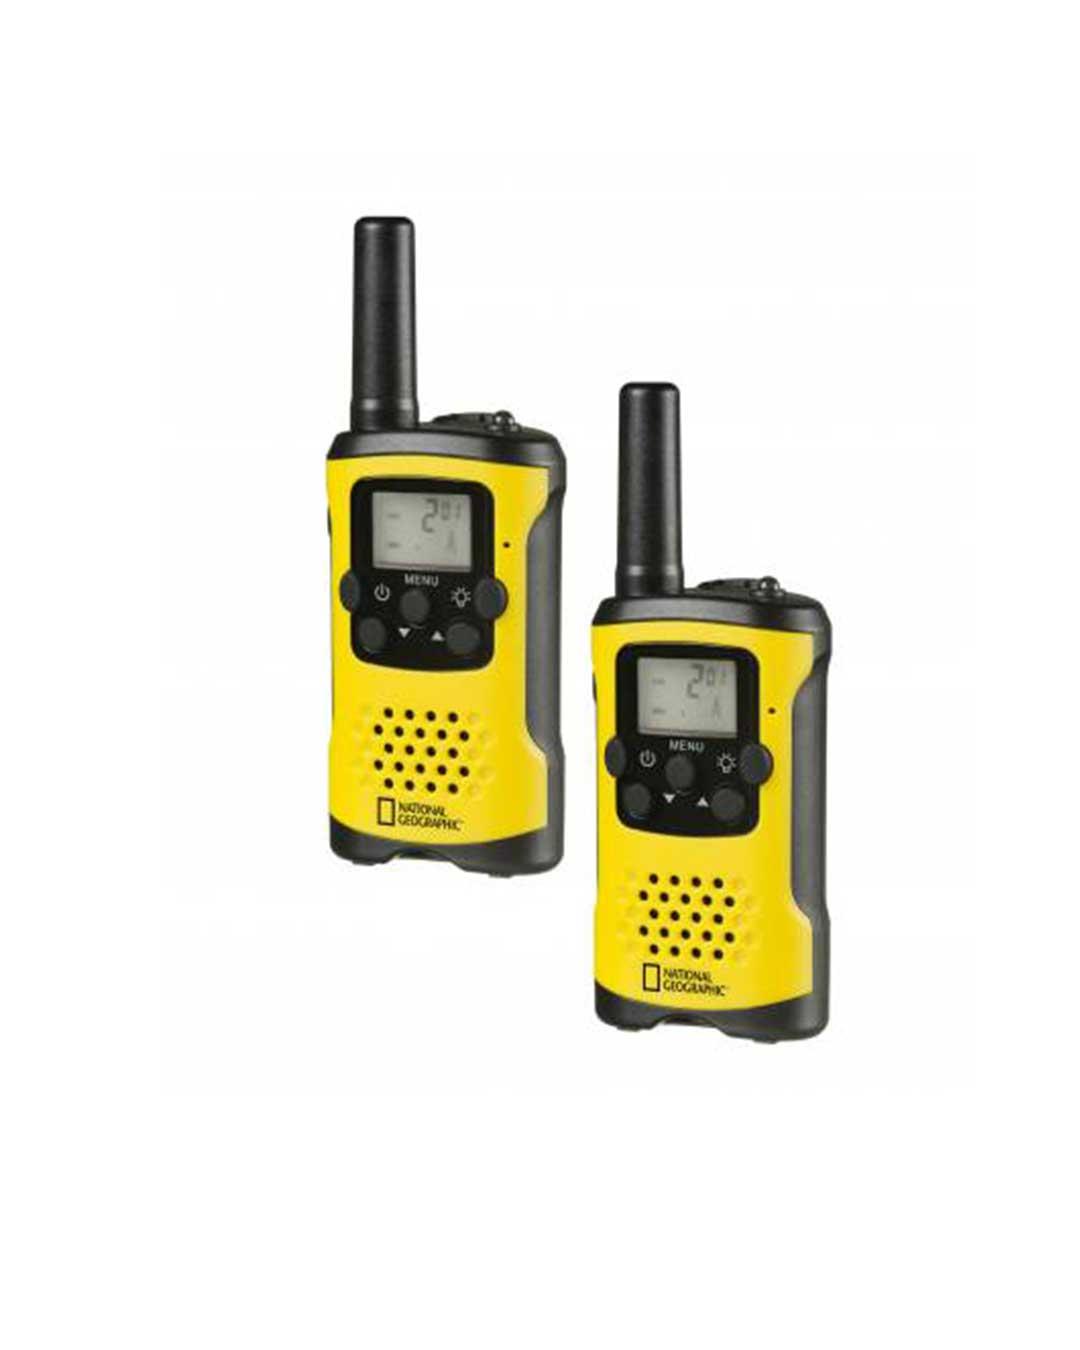 Juego de walkie-talkies National Geographic